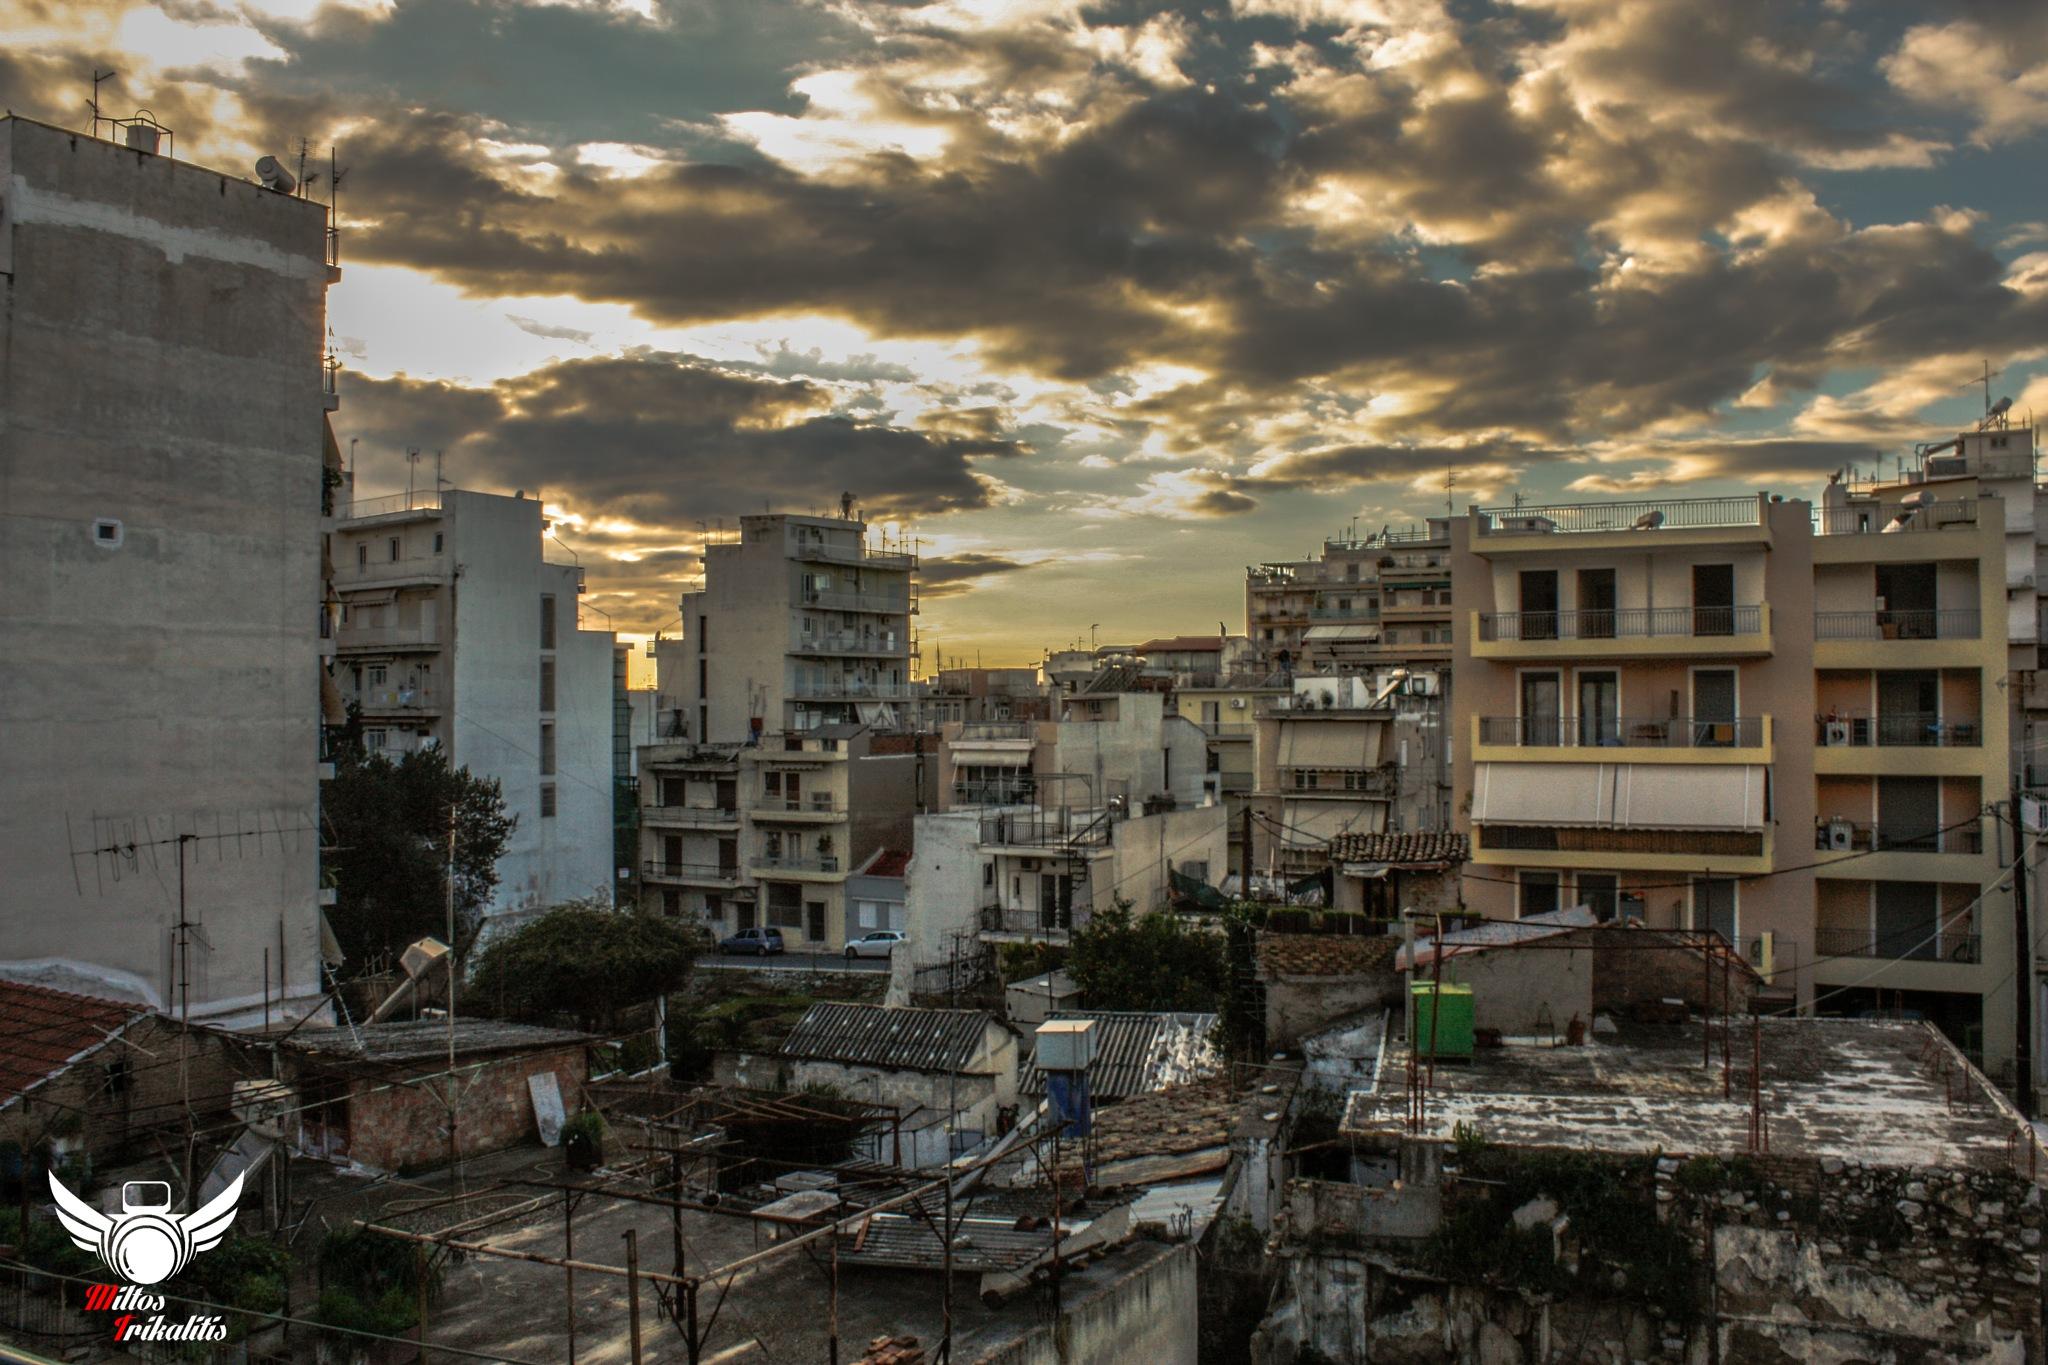 Urban Landscape by Miltos Trikalitis